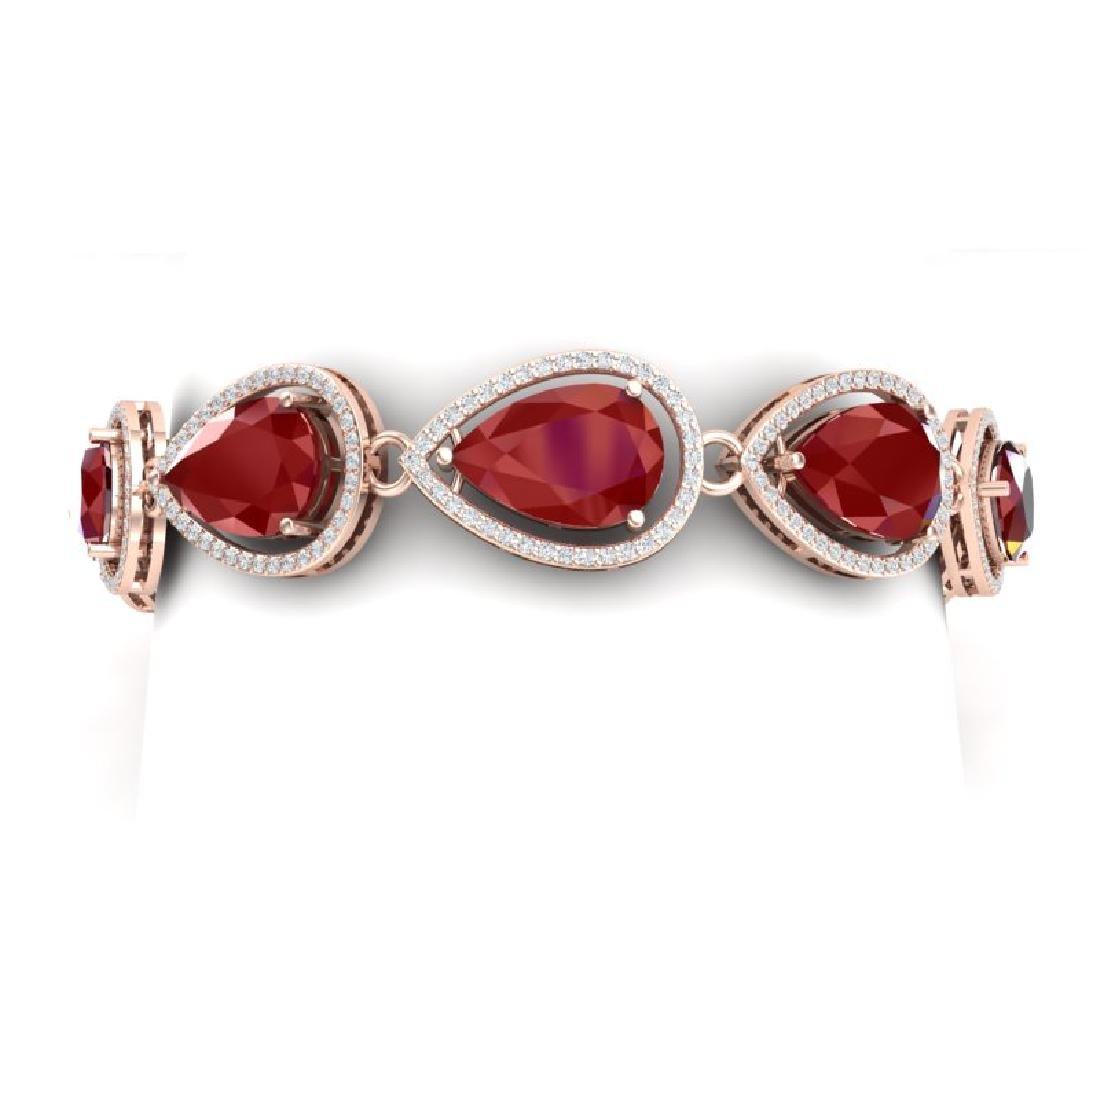 28.31 CTW Royalty Ruby & VS Diamond Bracelet 18K Rose